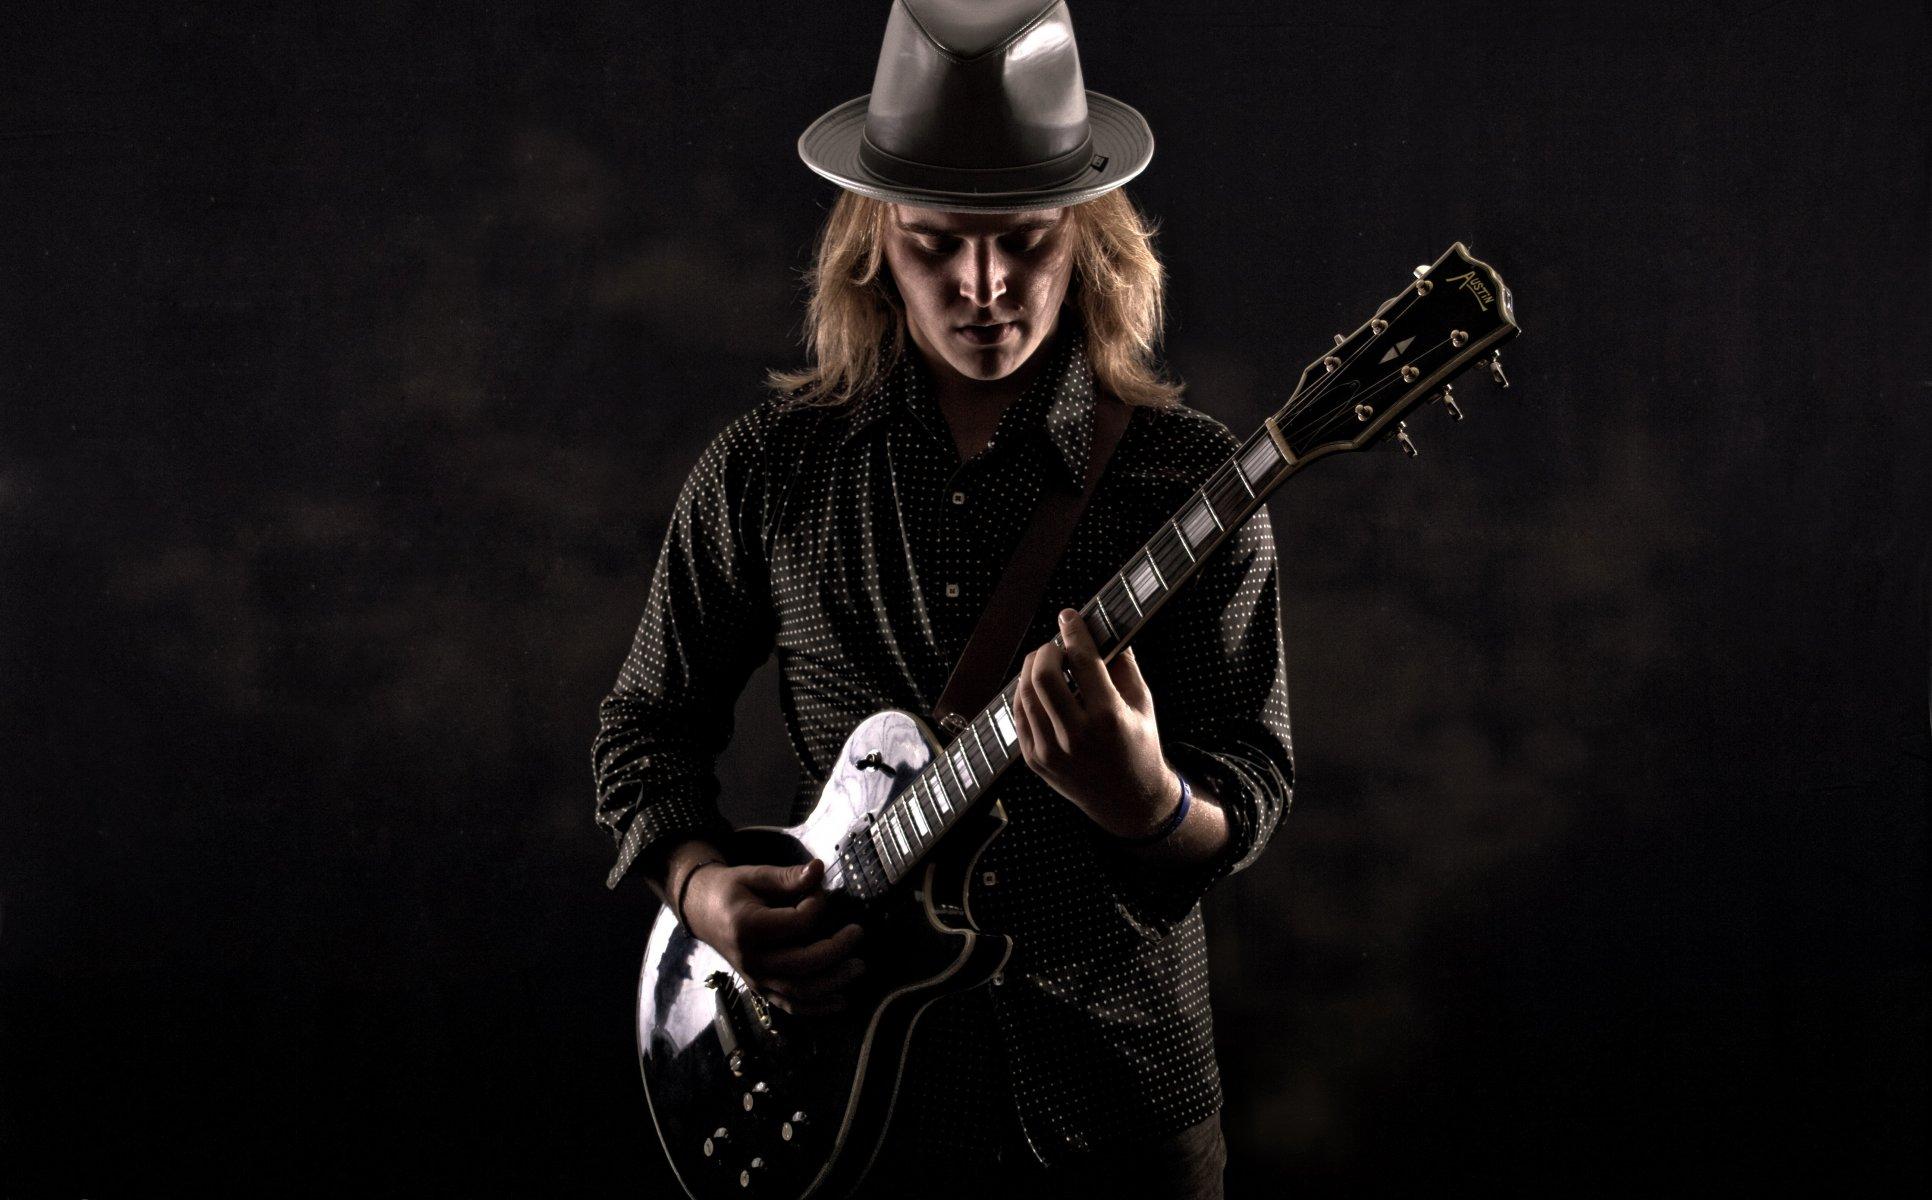 https://w-dog.ru/wallpapers/6/9/464888950320514/gitarist-gitara-muzyka-dzhejk-shepard.jpg